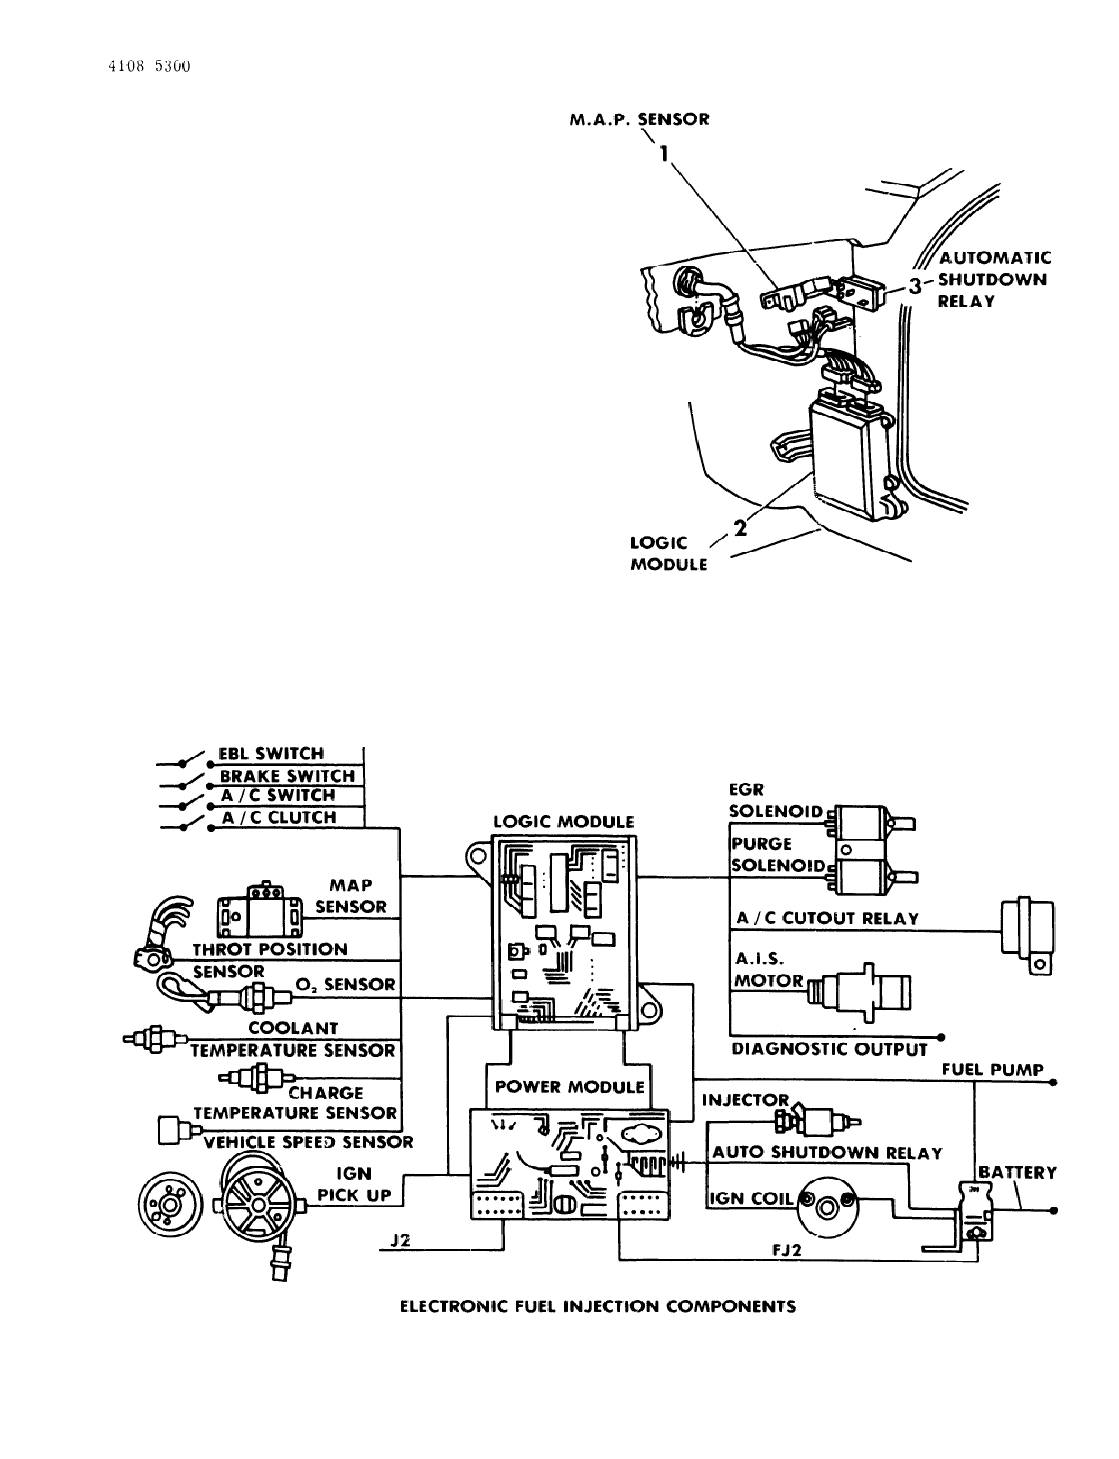 1984 Dodge Rampage M.A.P. Sensor & Logic Module